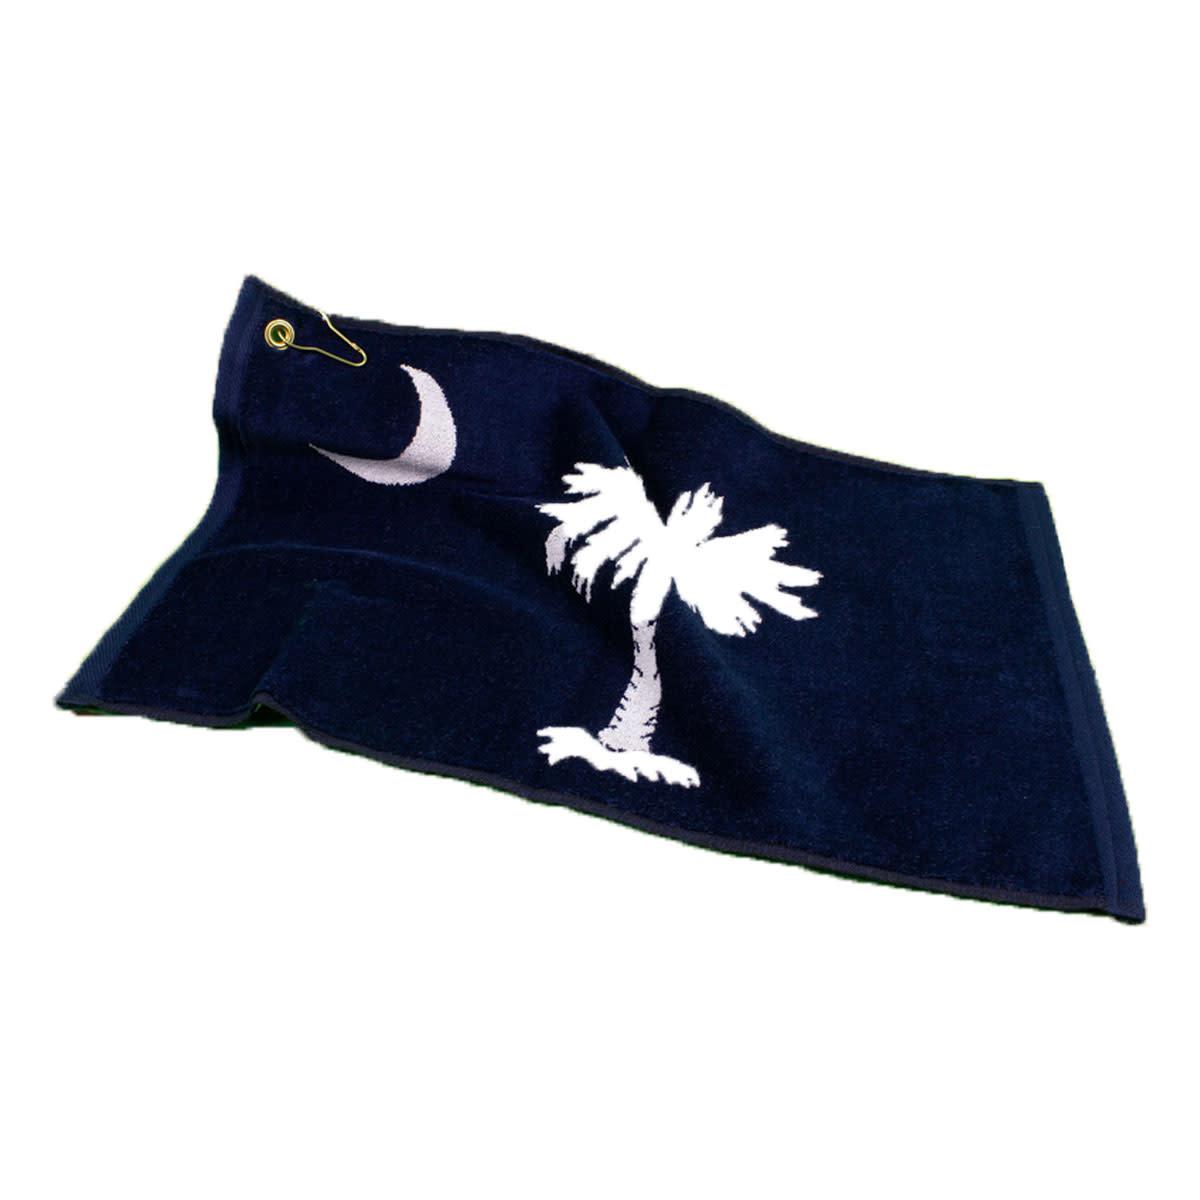 Textiles SC Flag - Sheared Jacquard Golf Towel